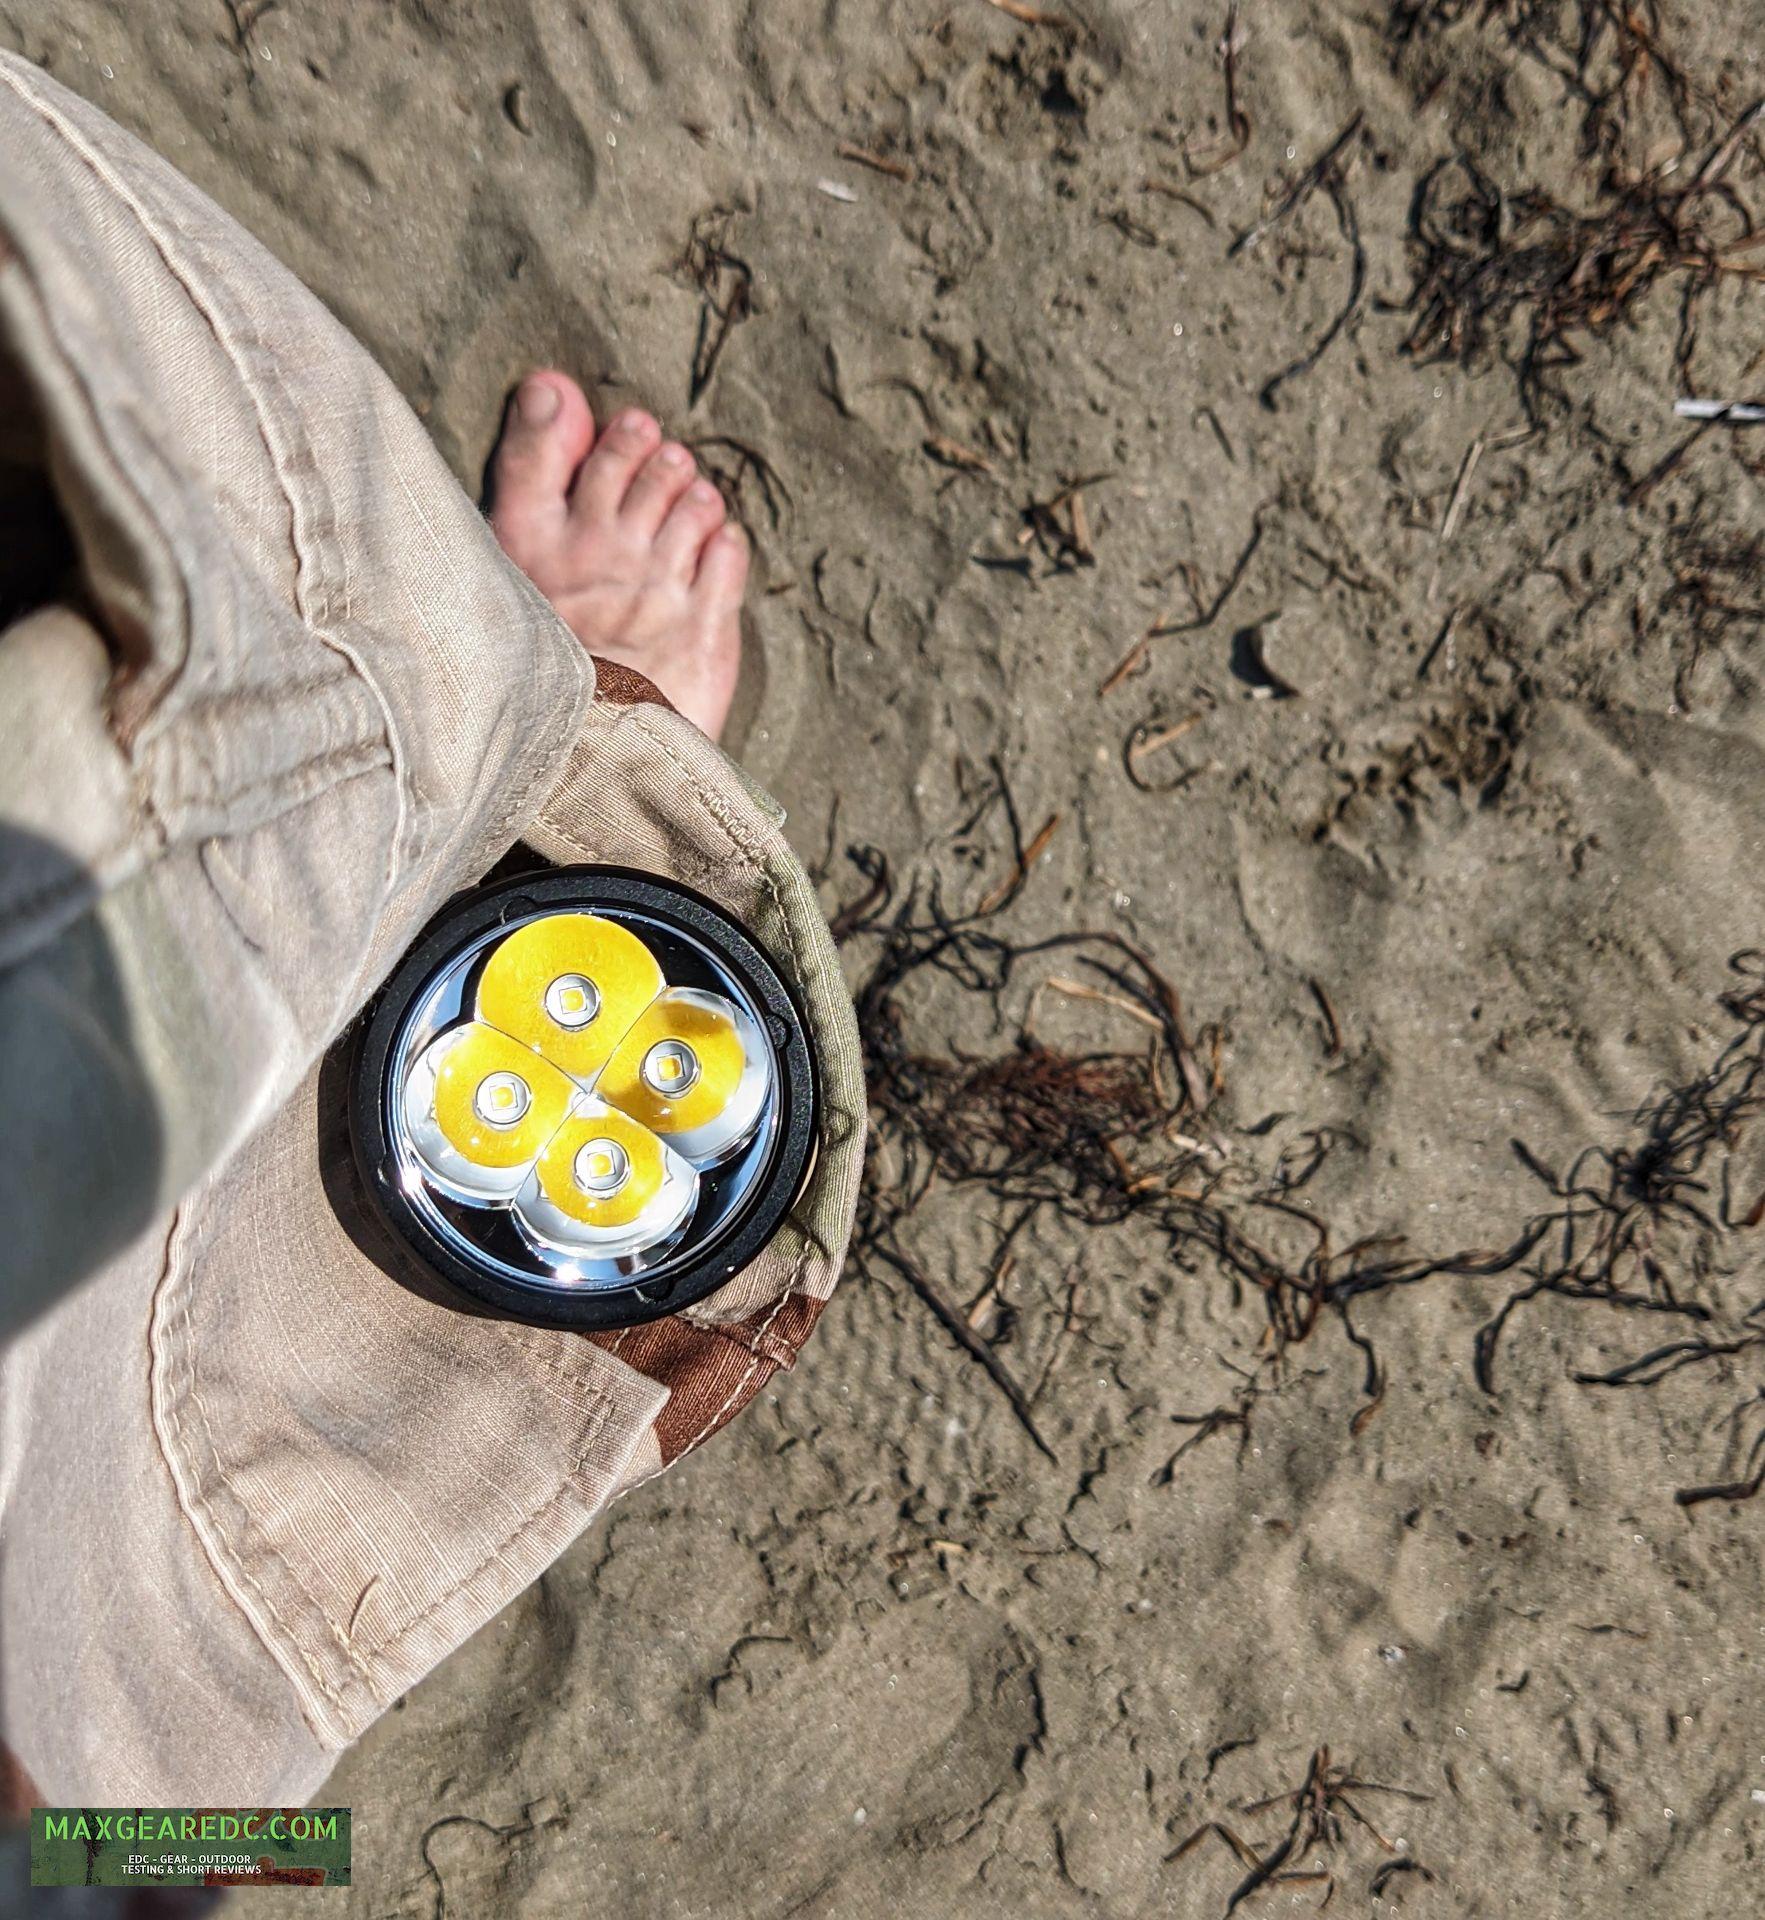 Wurkkos_DL40_Diving_Flashlight_Review_Aluminium_26650_maxgearedc.com_EDC_GEAR_OUTDOOR_TESTING_and_SHORT_REVIEWS_9